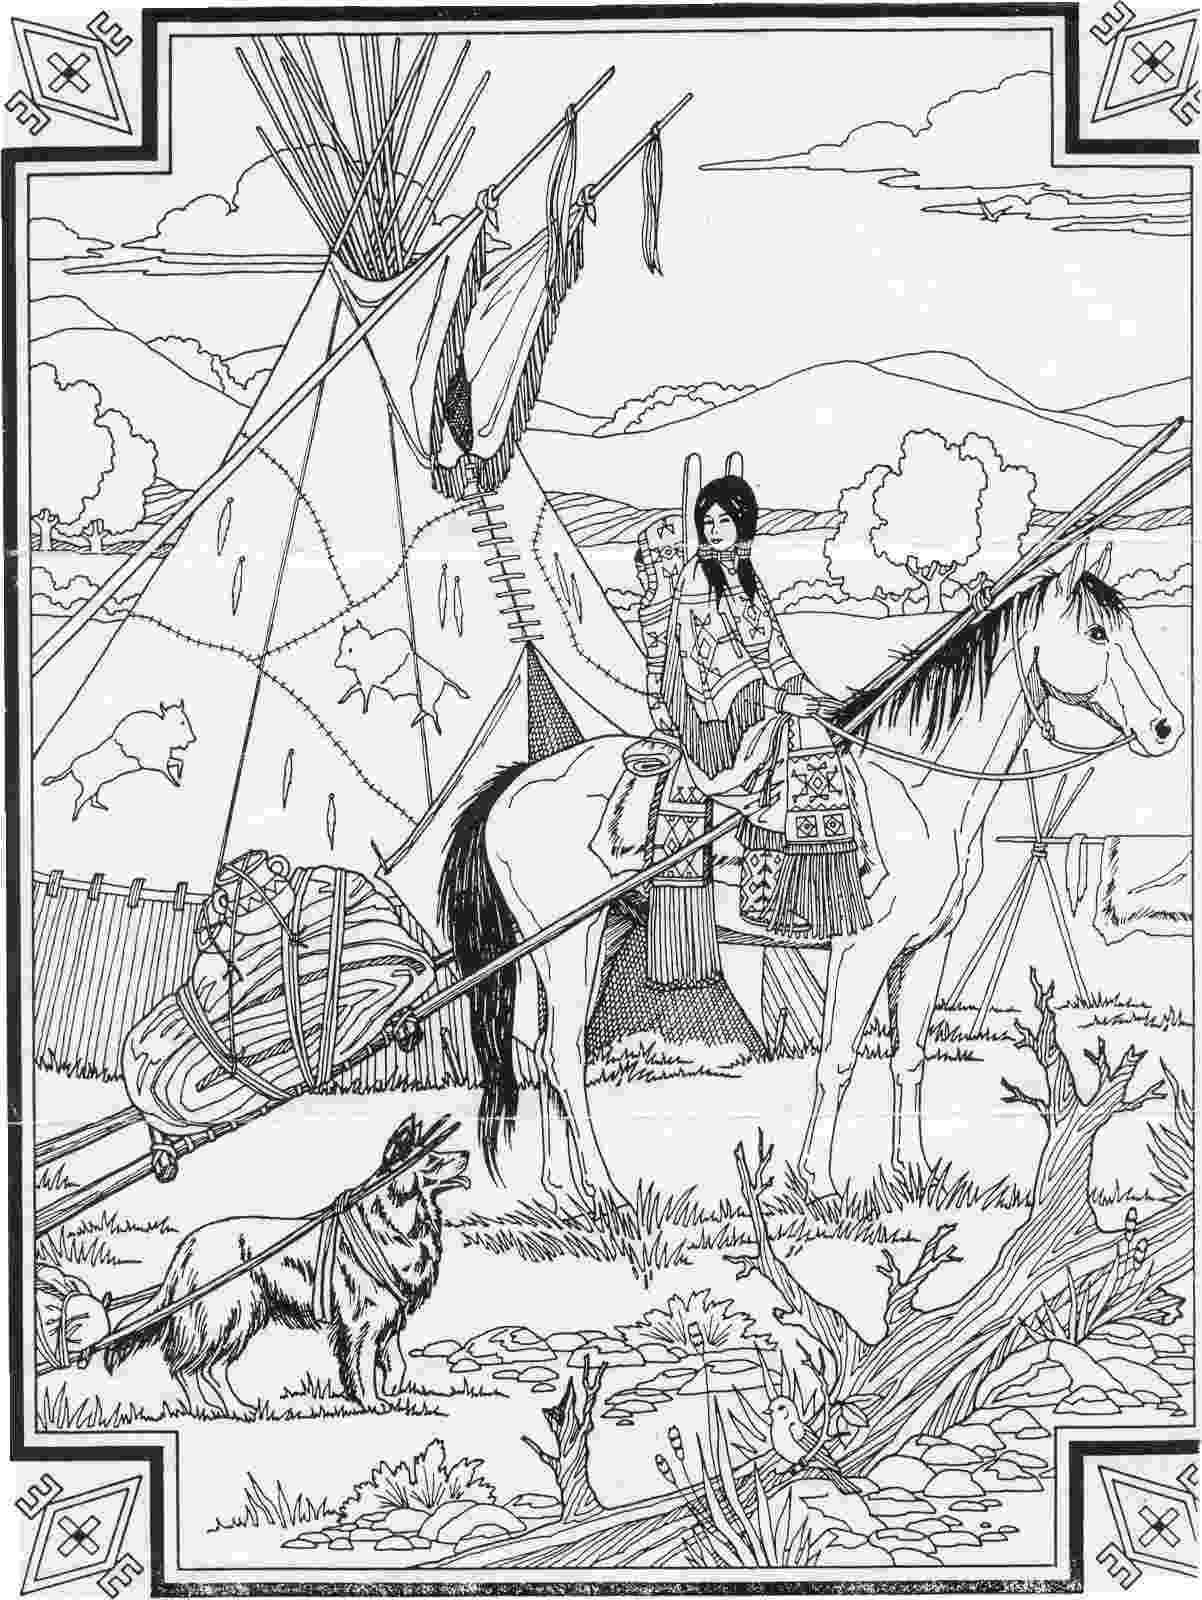 native american designs to color native american designs coloring pages sketch coloring page native american color designs to